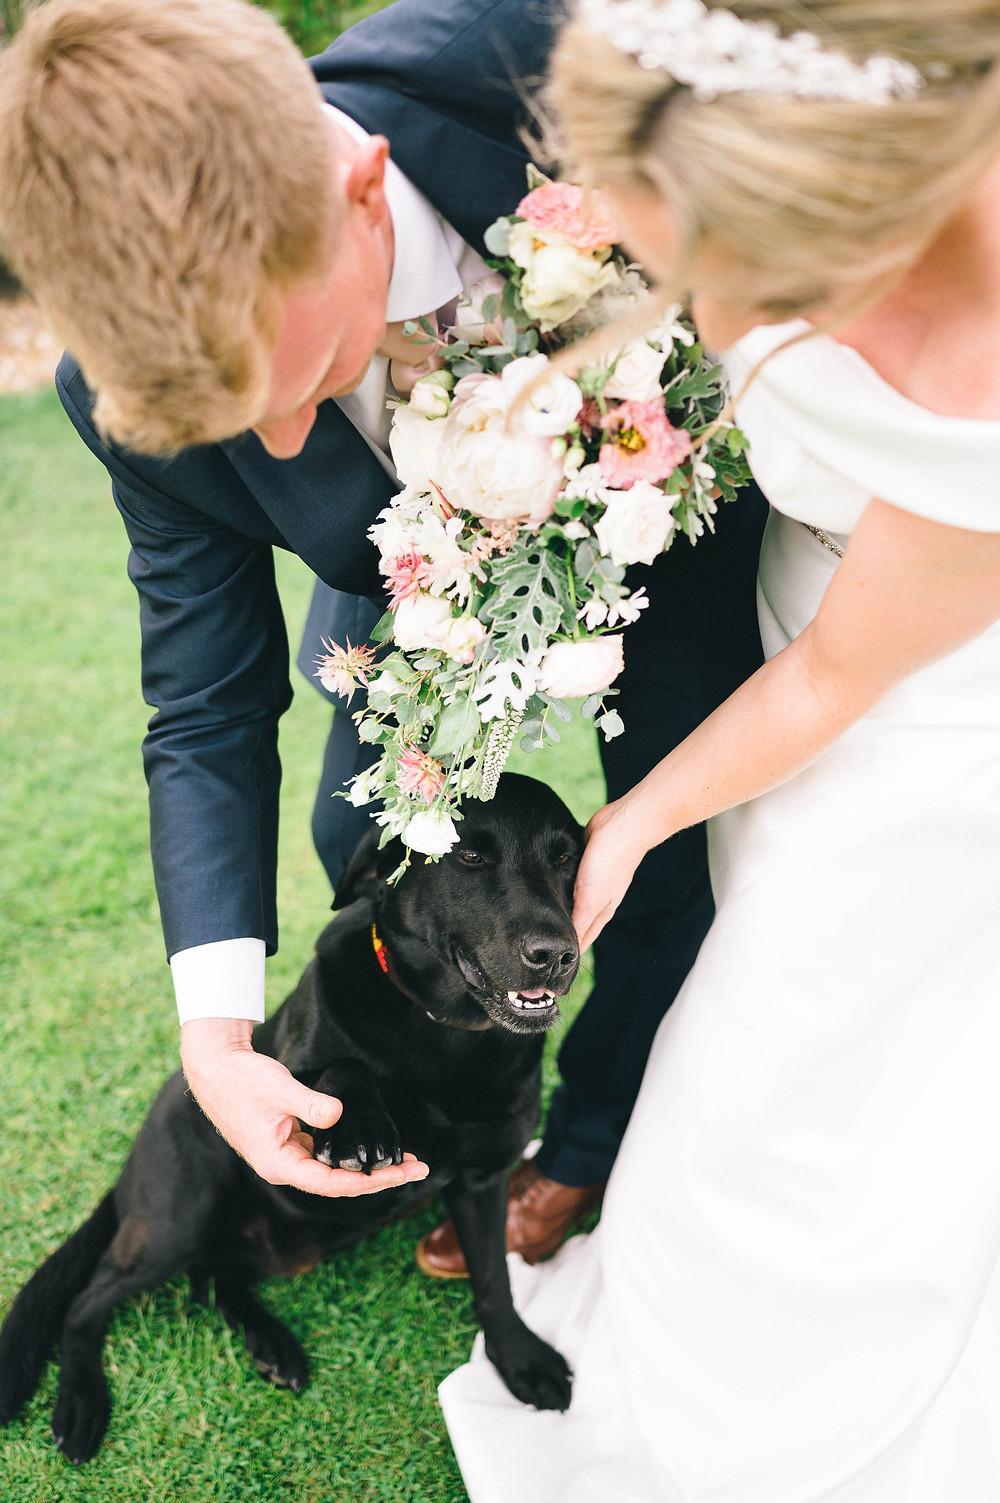 Rookery Hall Wedding Photographer, Sandhole Oak Barn Wedding Photographer, Slaters Country Inn Wedding Photographer, Nantwich Photography